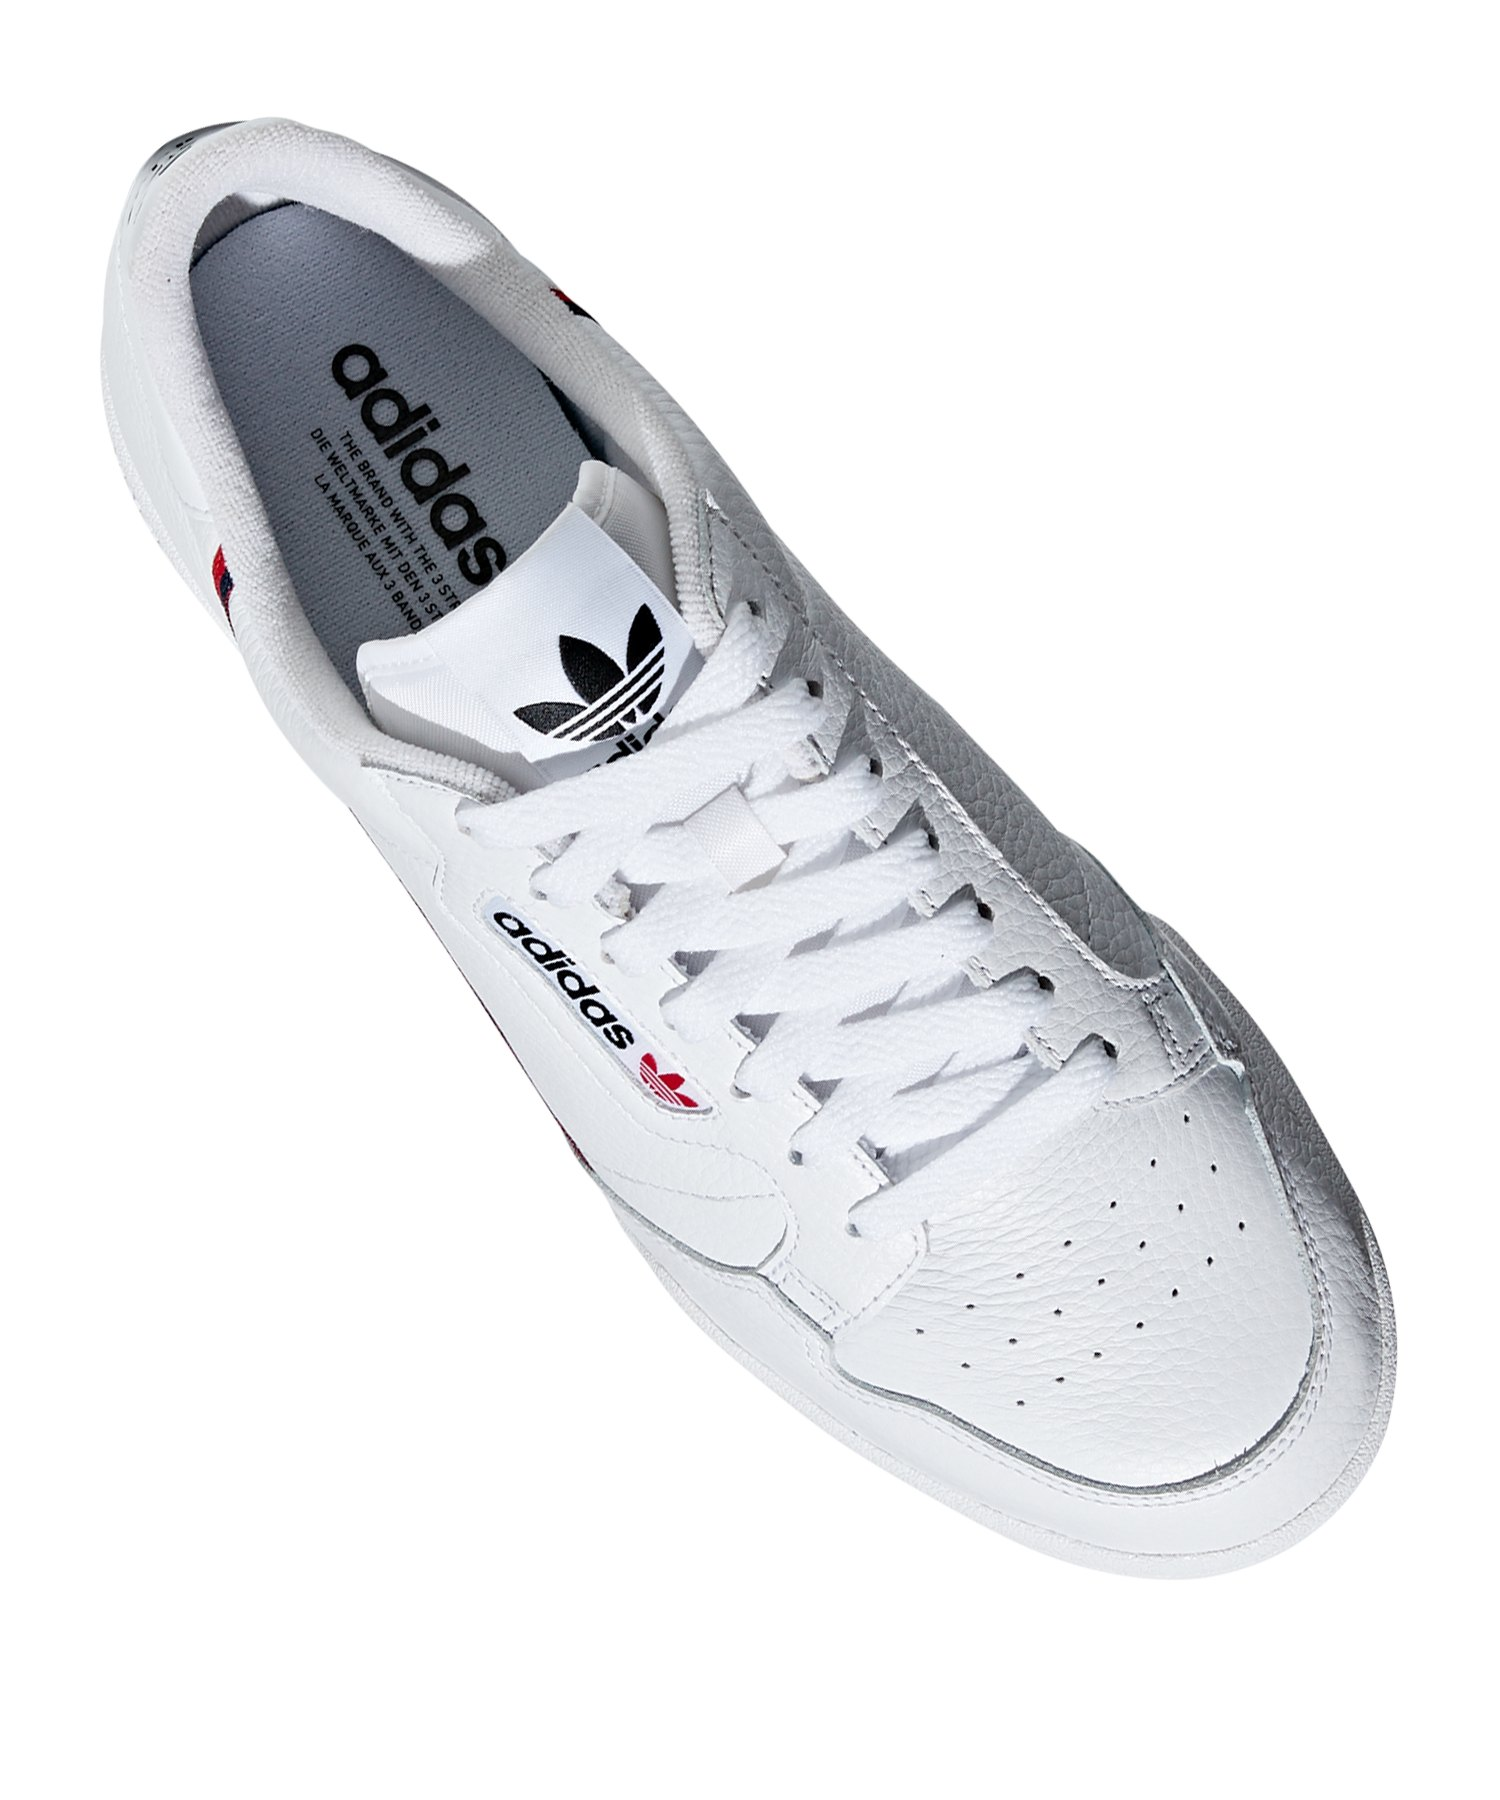 Adidas Schuhe Yeezy Yeezy Adidas Bih Damen Damen Tl31JFKc